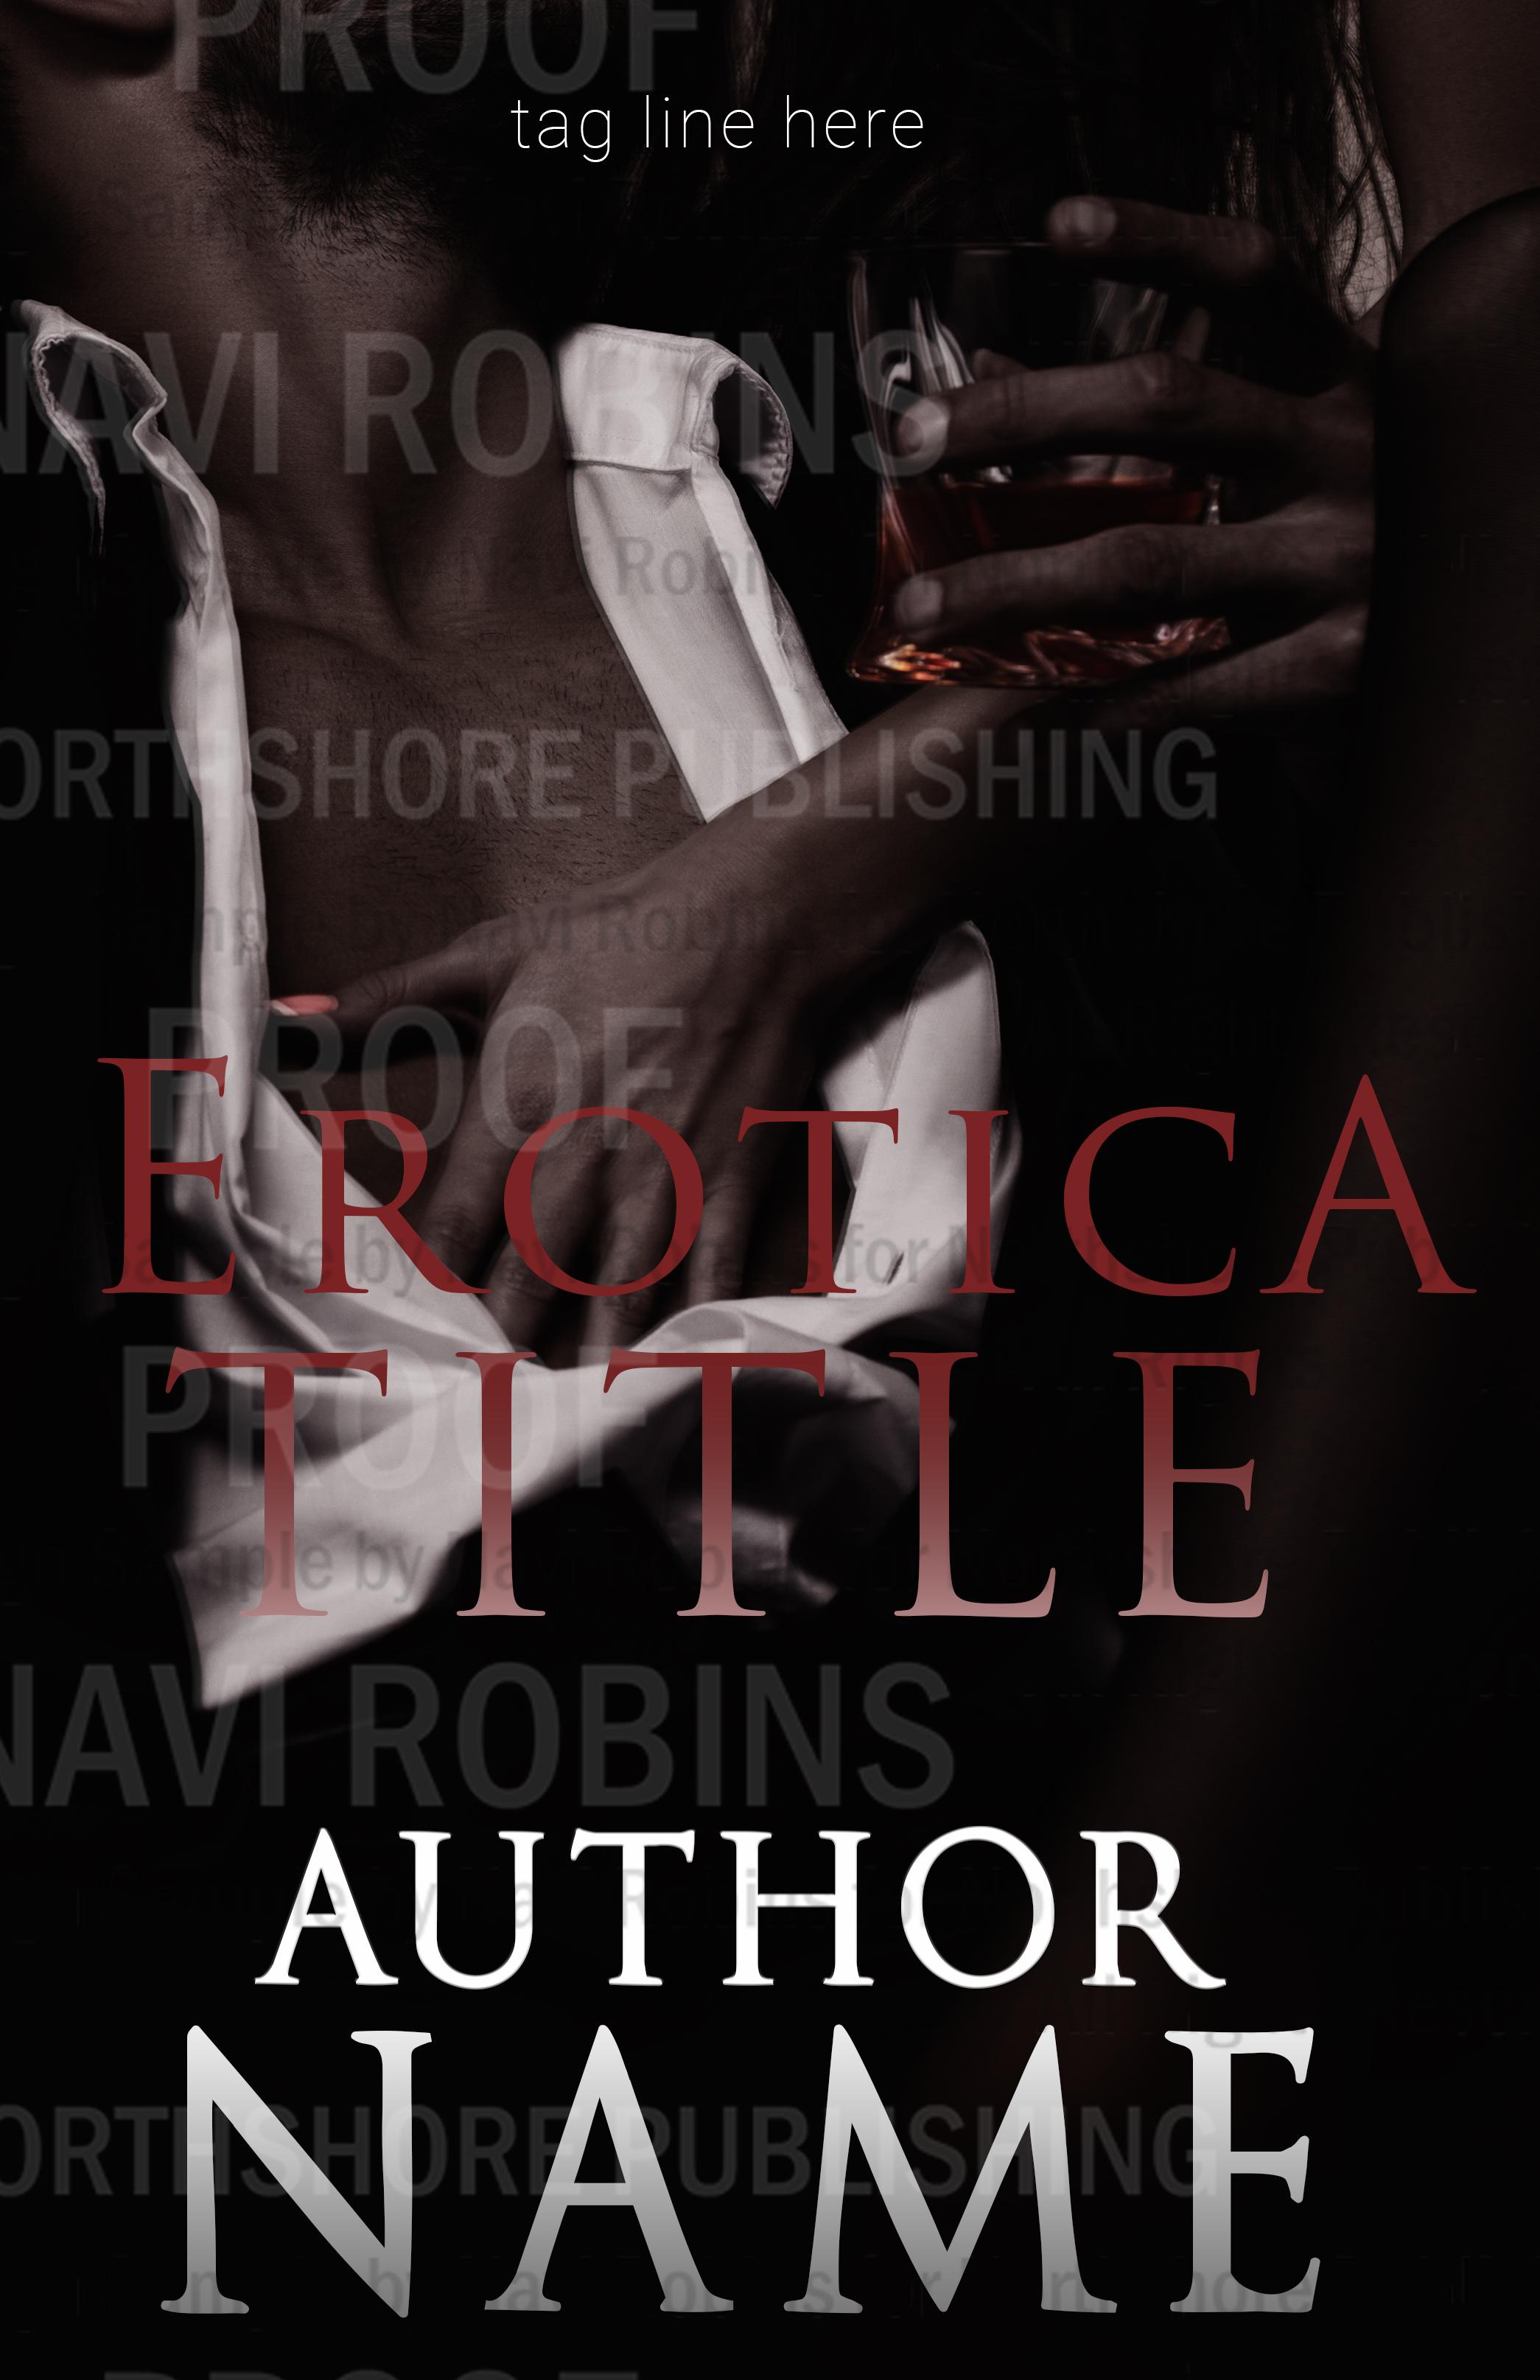 erotica cover 2 6-8-18